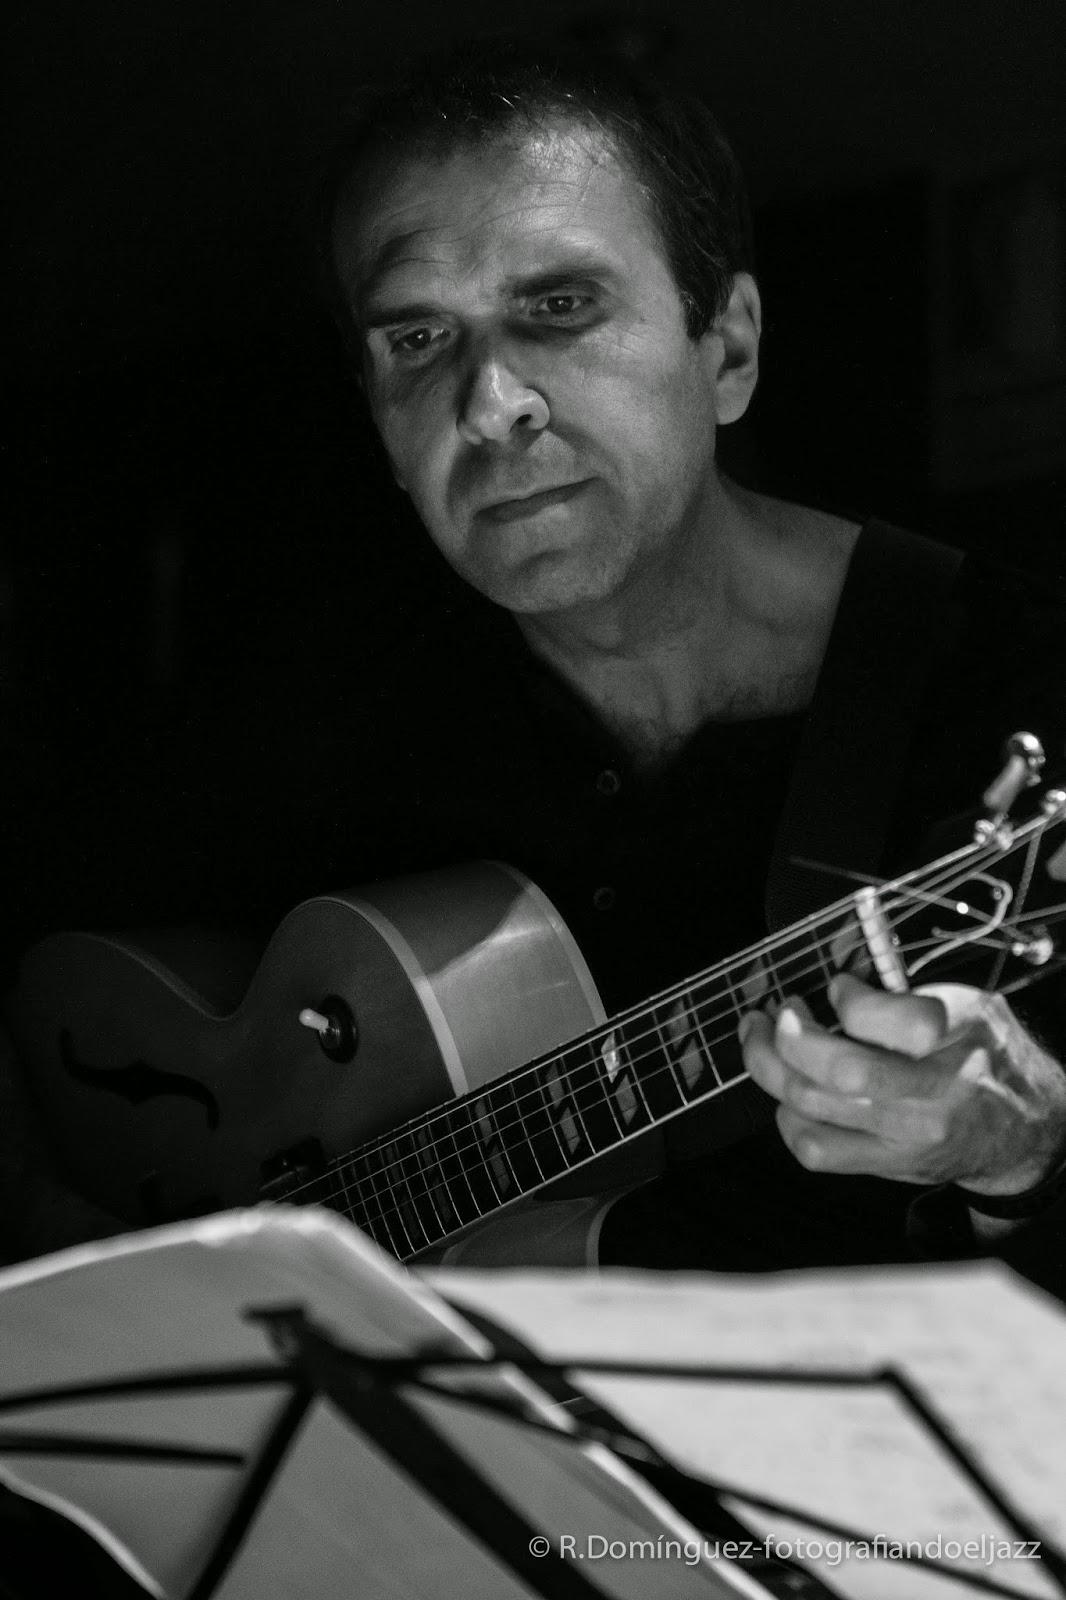 © R.Domínguez - Hispania Fantastic - Antonio Bravo